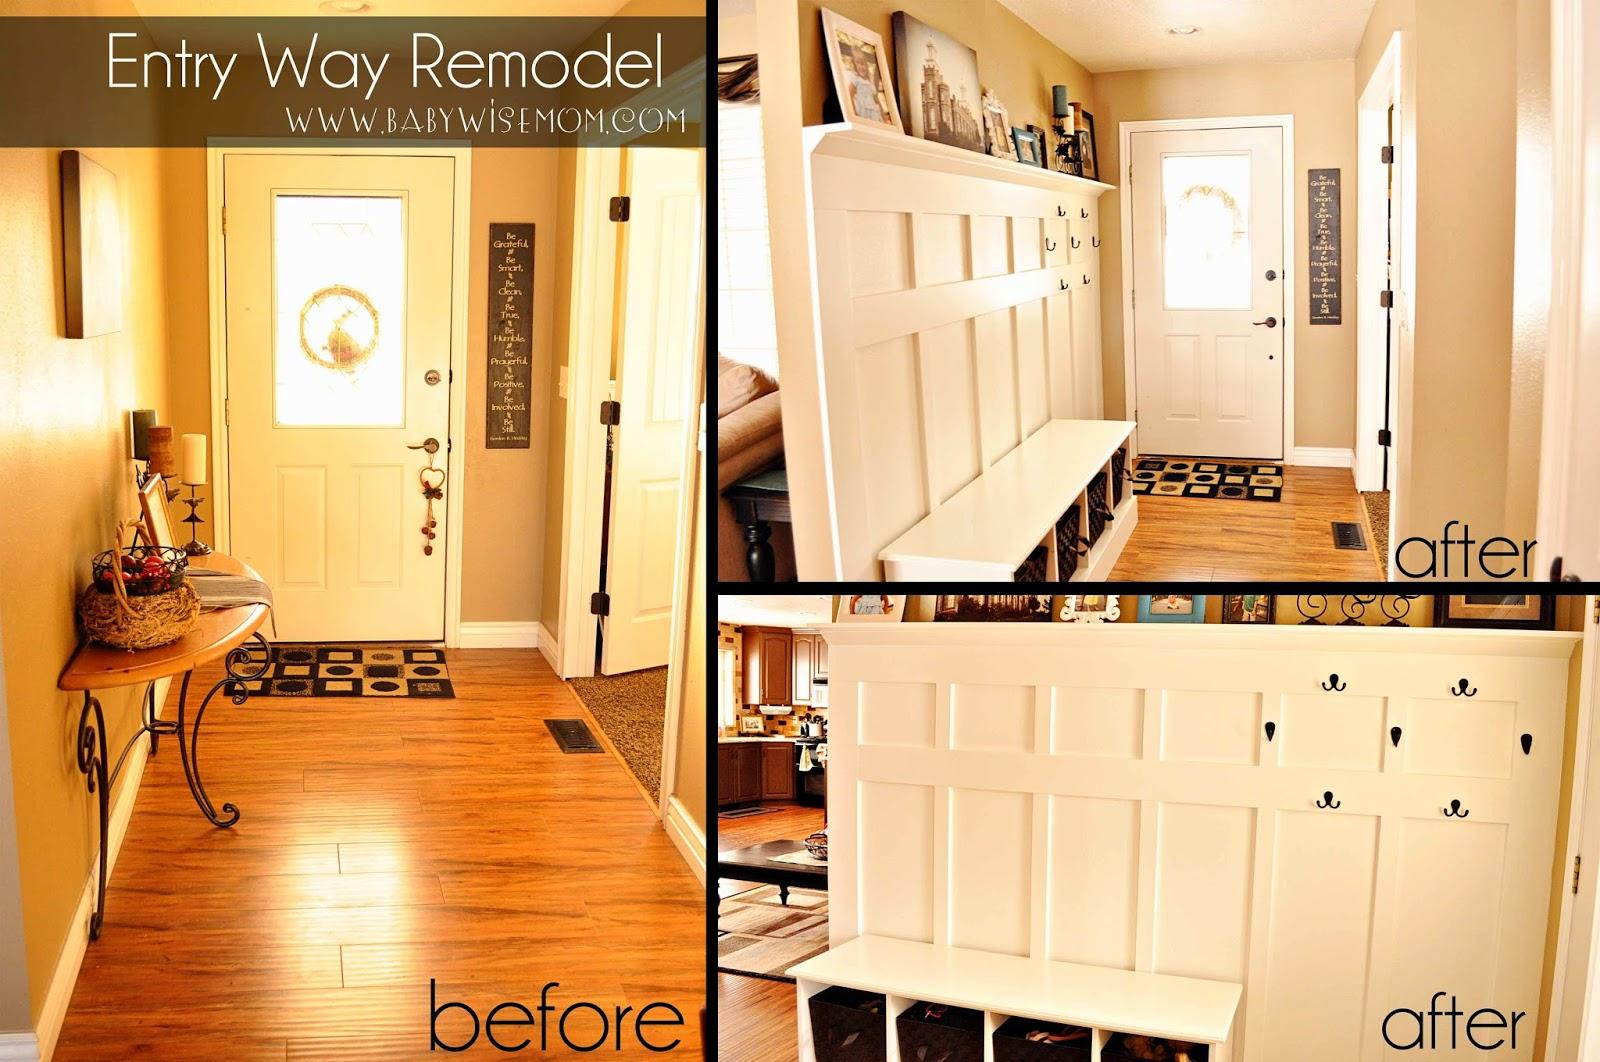 Remodeled DIY Board & Batten Entry Way